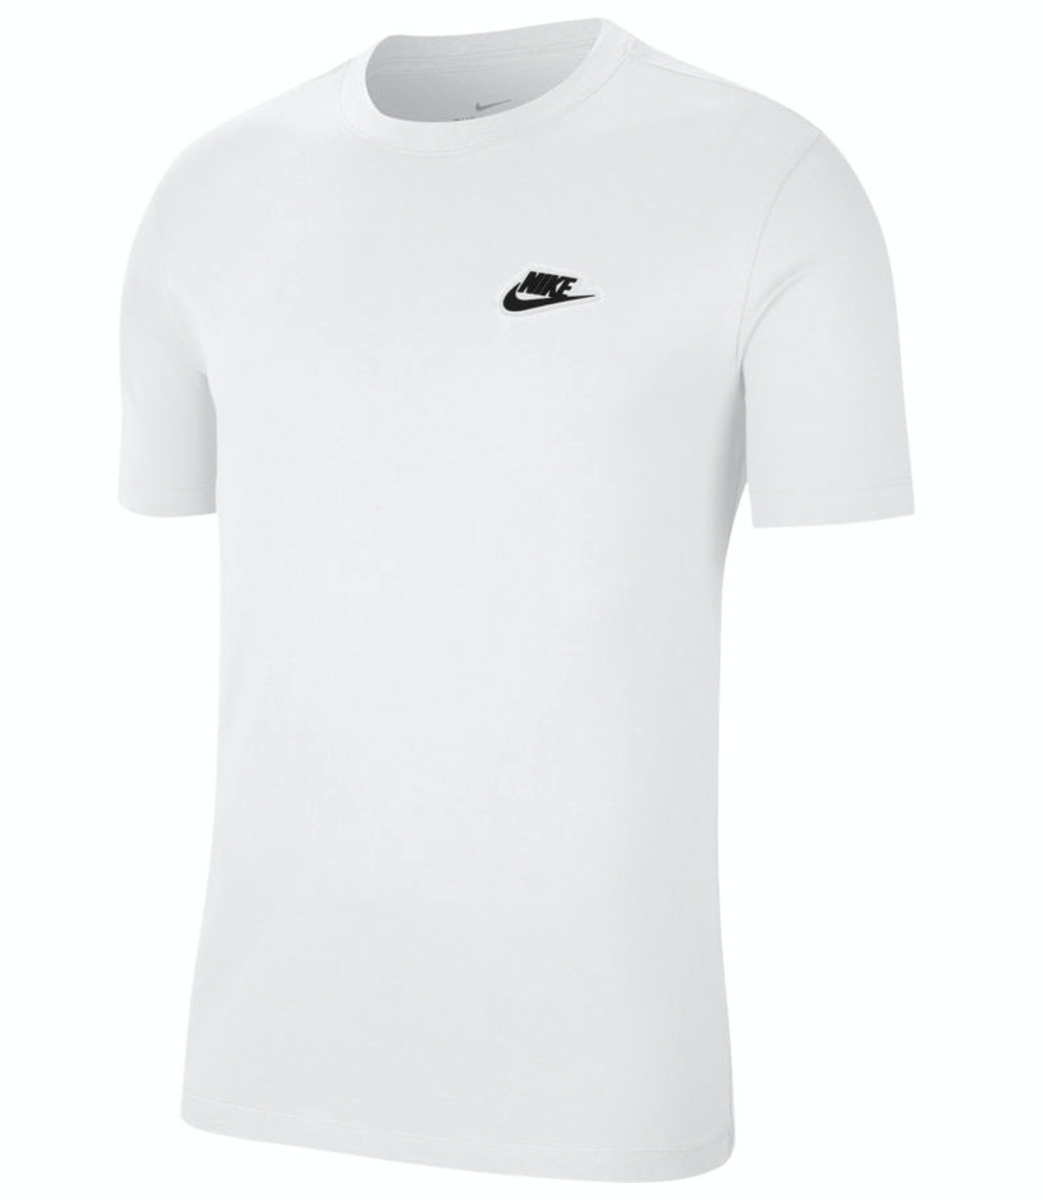 Bilde av Nike M tee CU8916-100